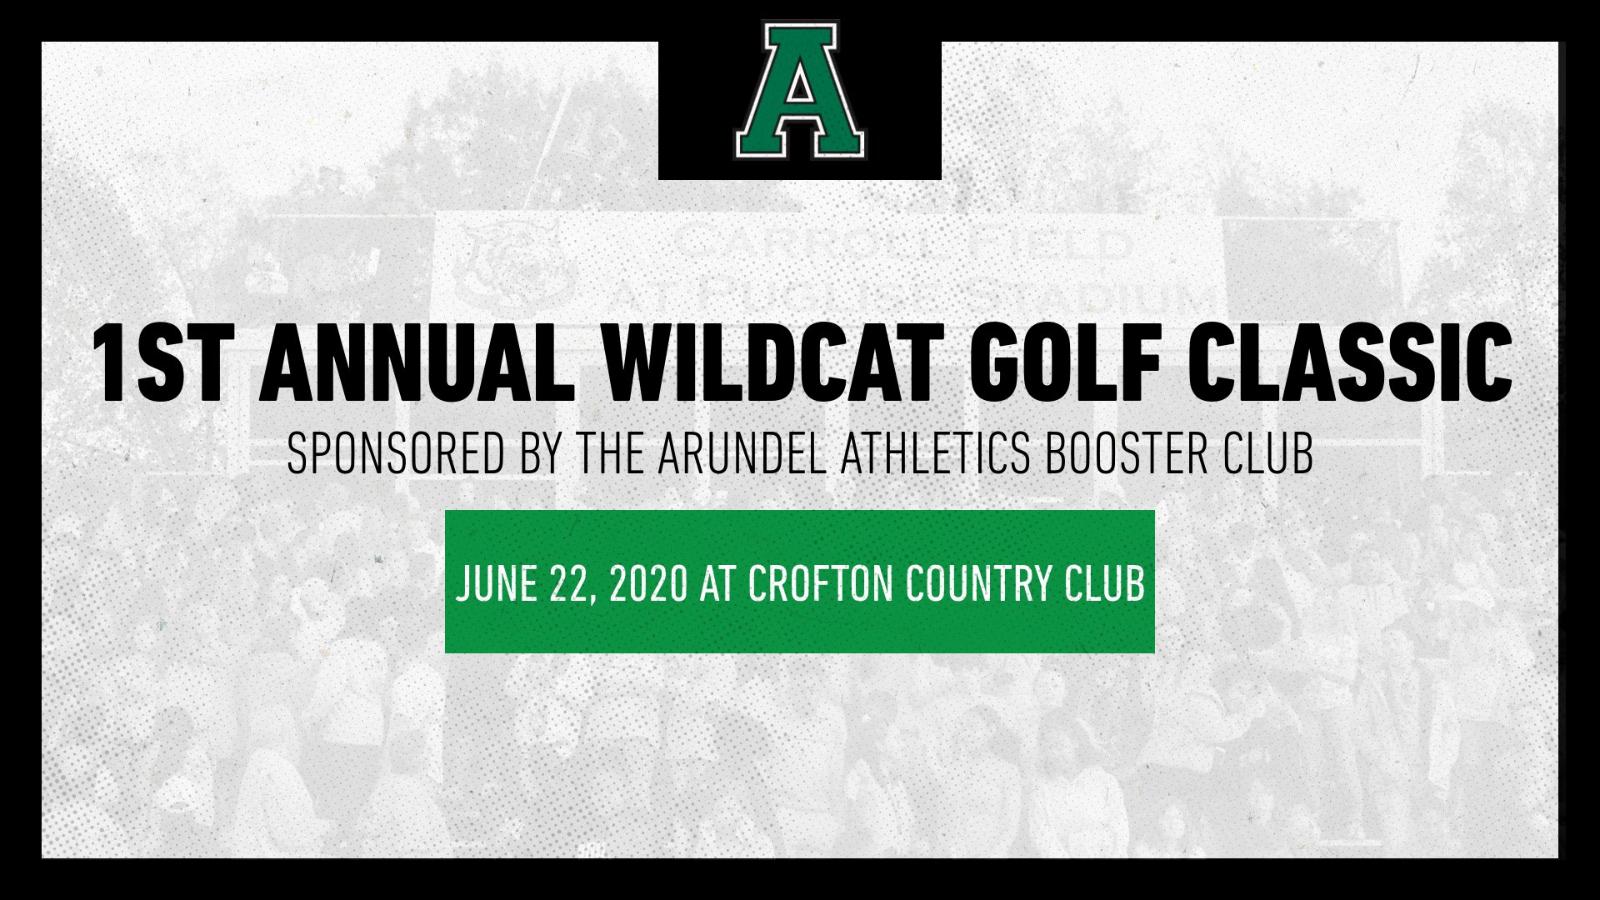 1st Annual Wildcat Golf Classic